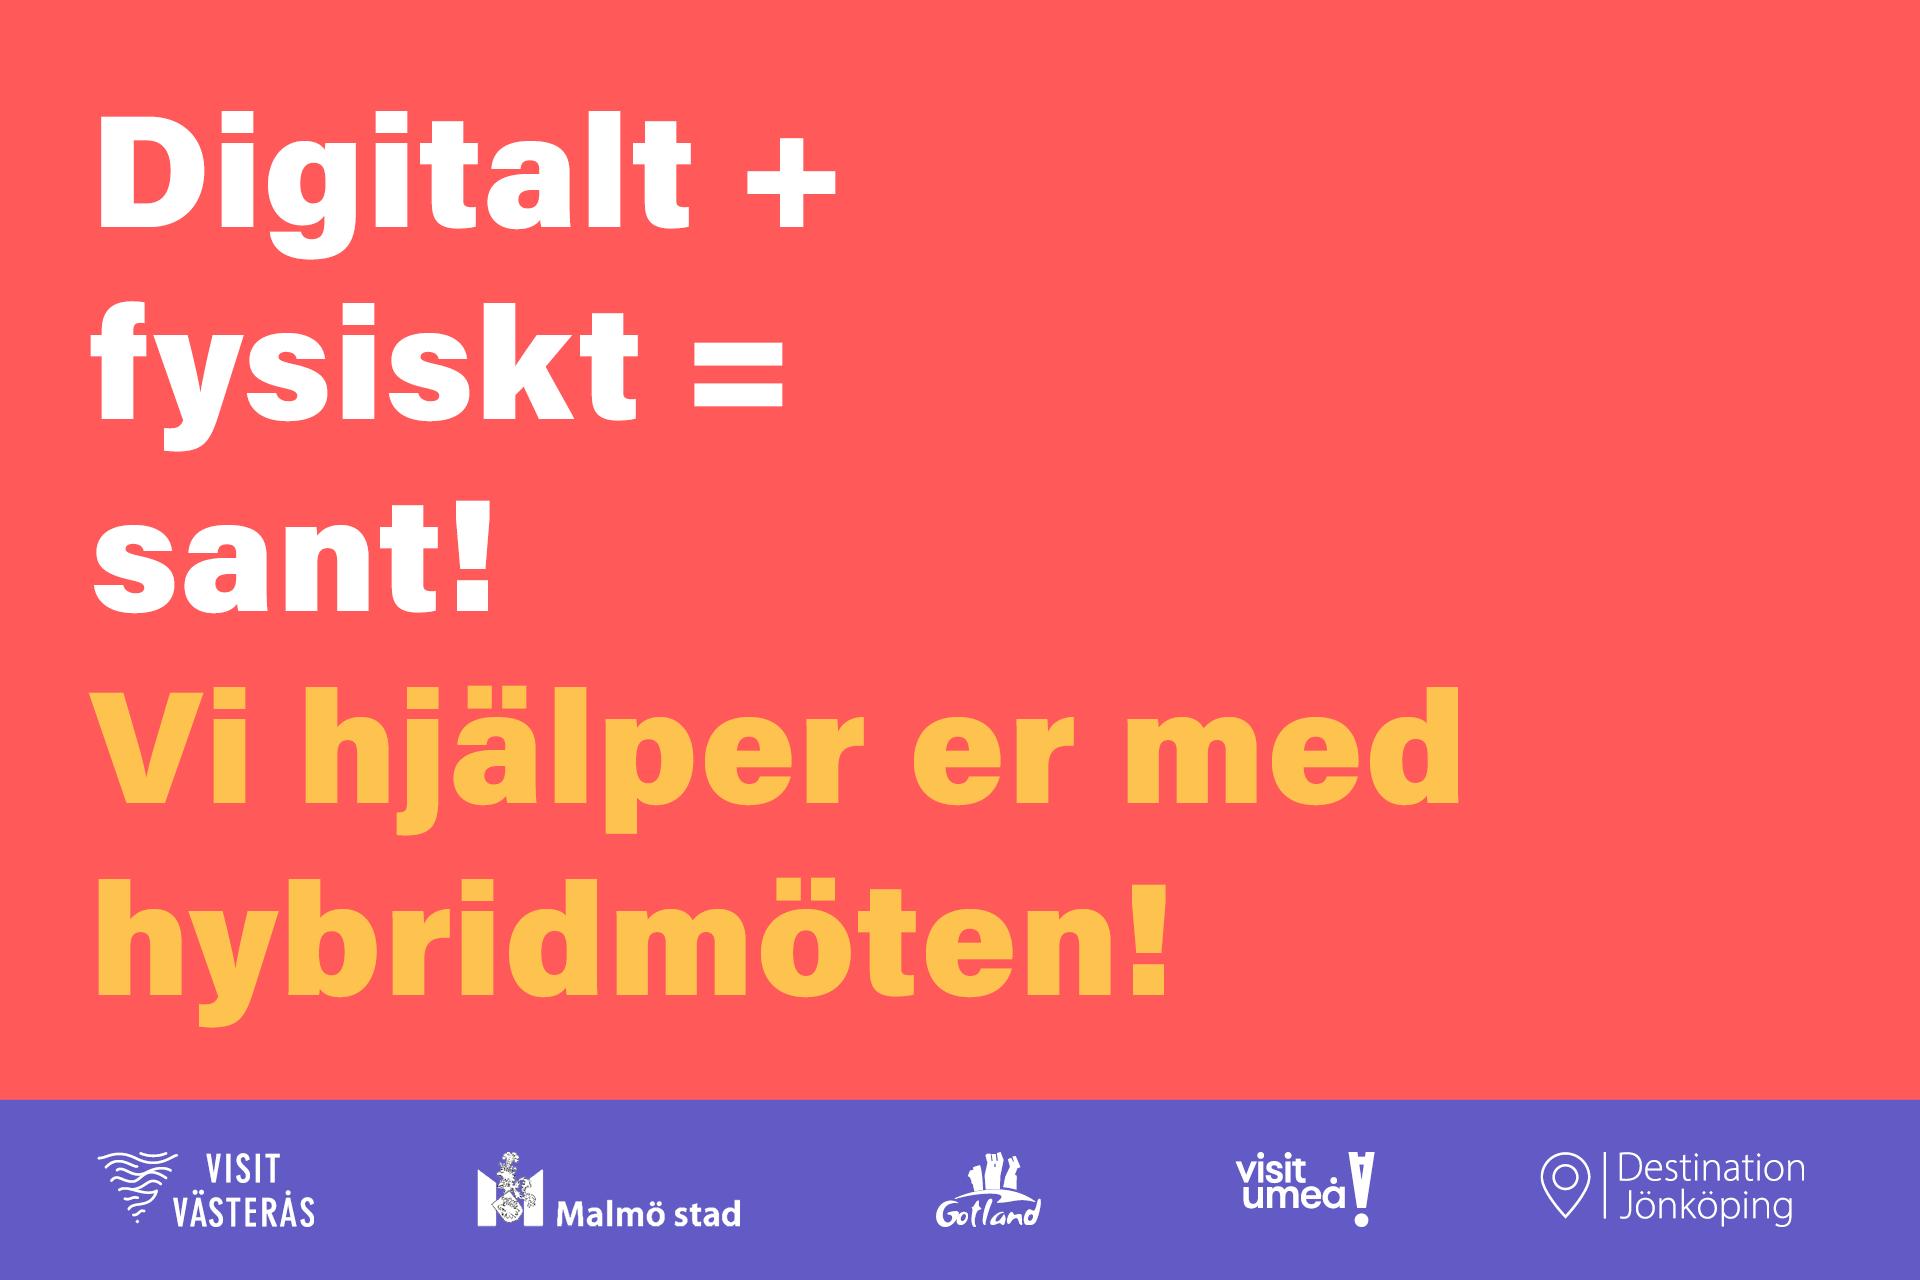 Illustration: Digitalt + fysiskt = sant!